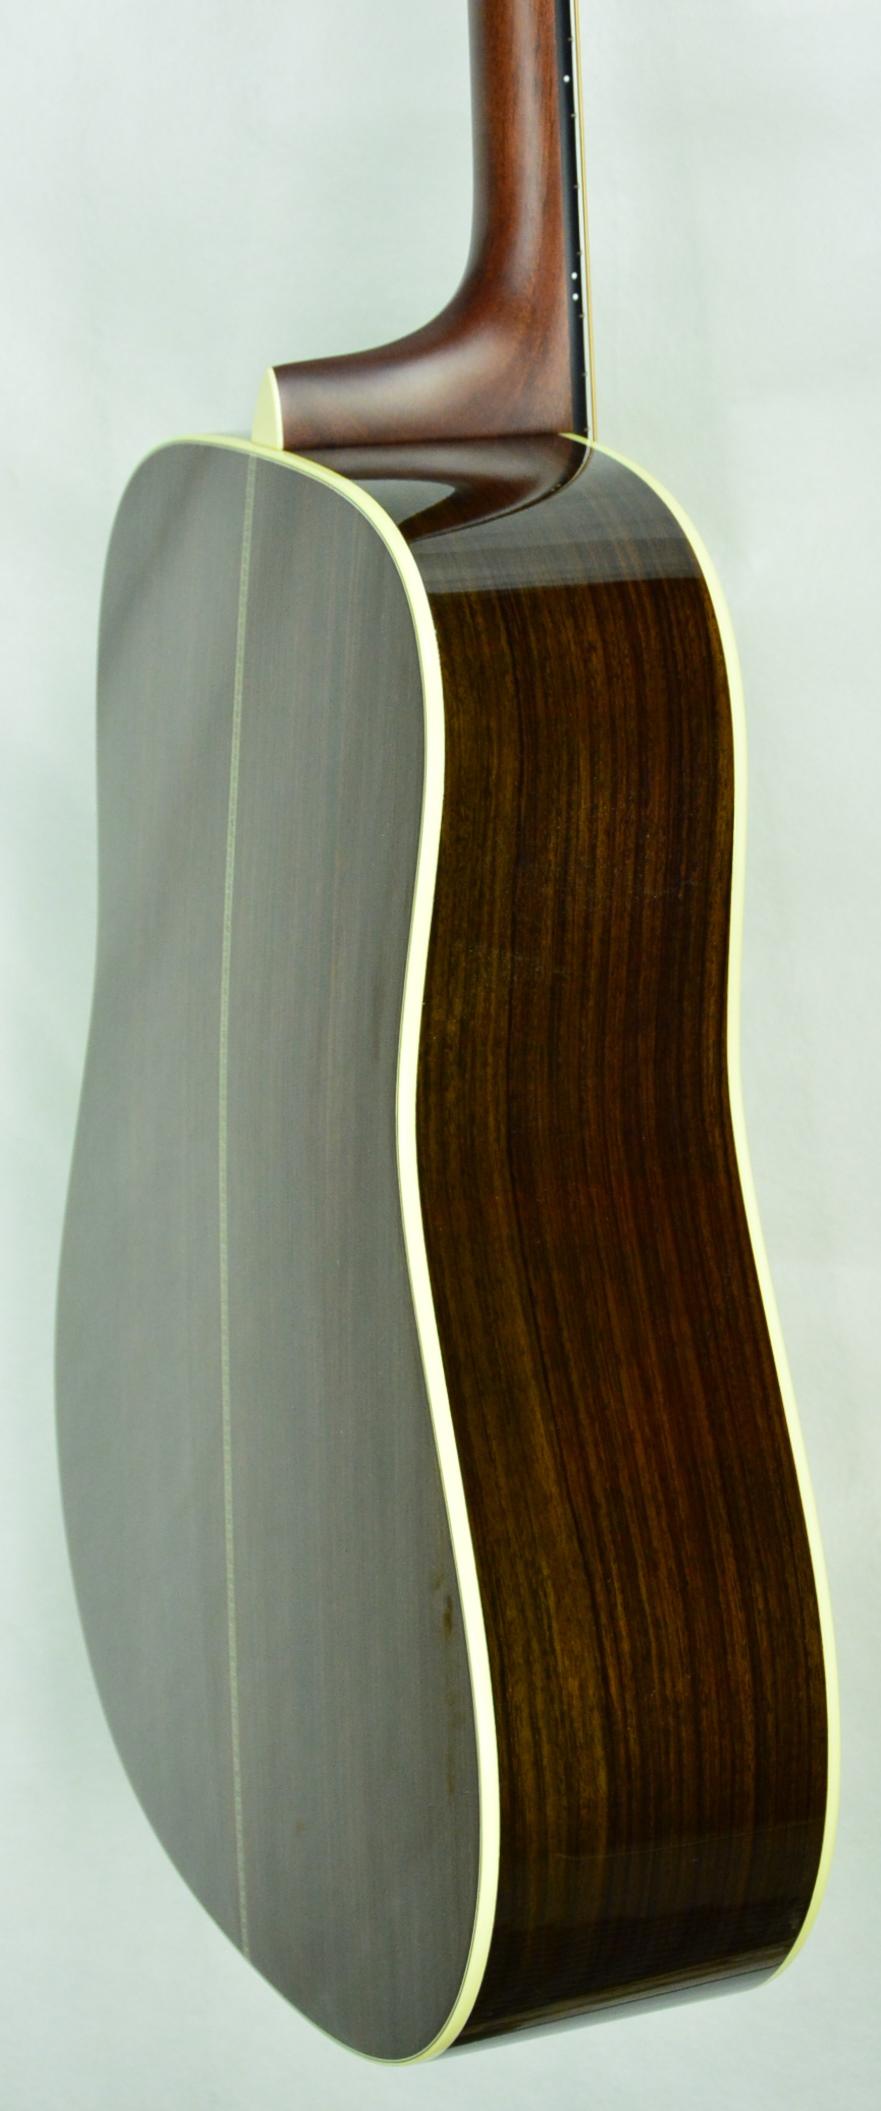 Q-2061624 S-1706648 D-14 Adi EIRW Matrix Blend (3).JPG